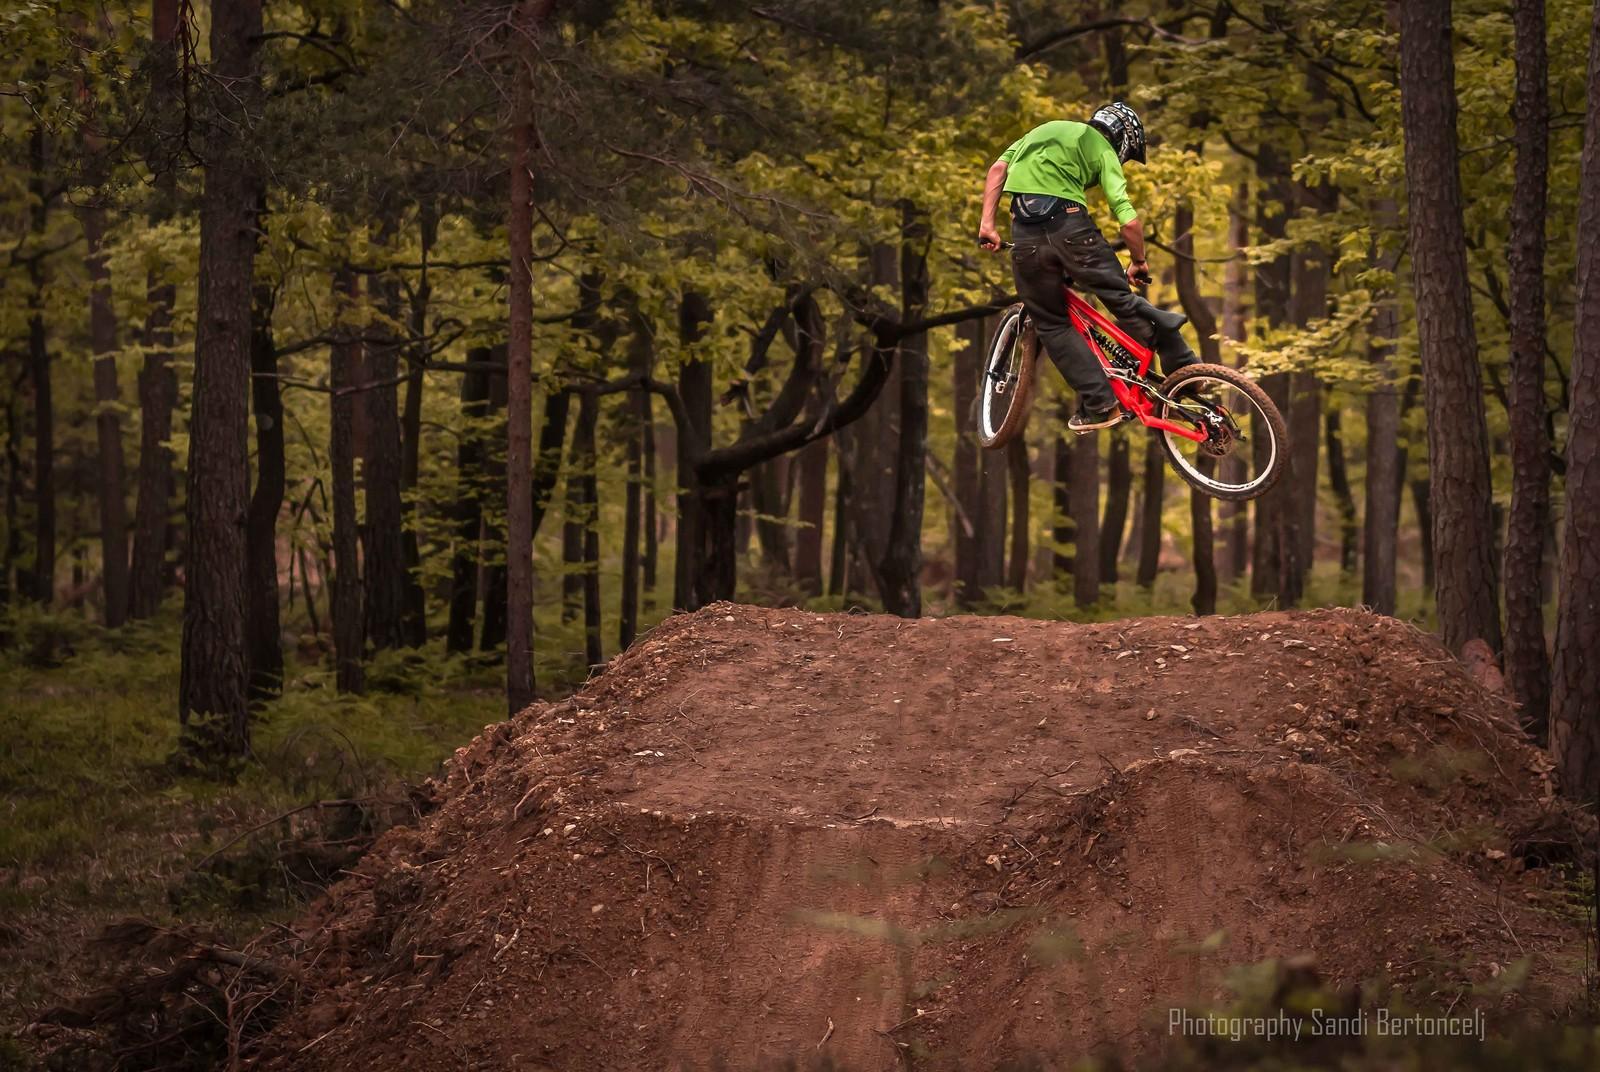 Gregor in the air - berto - Mountain Biking Pictures - Vital MTB